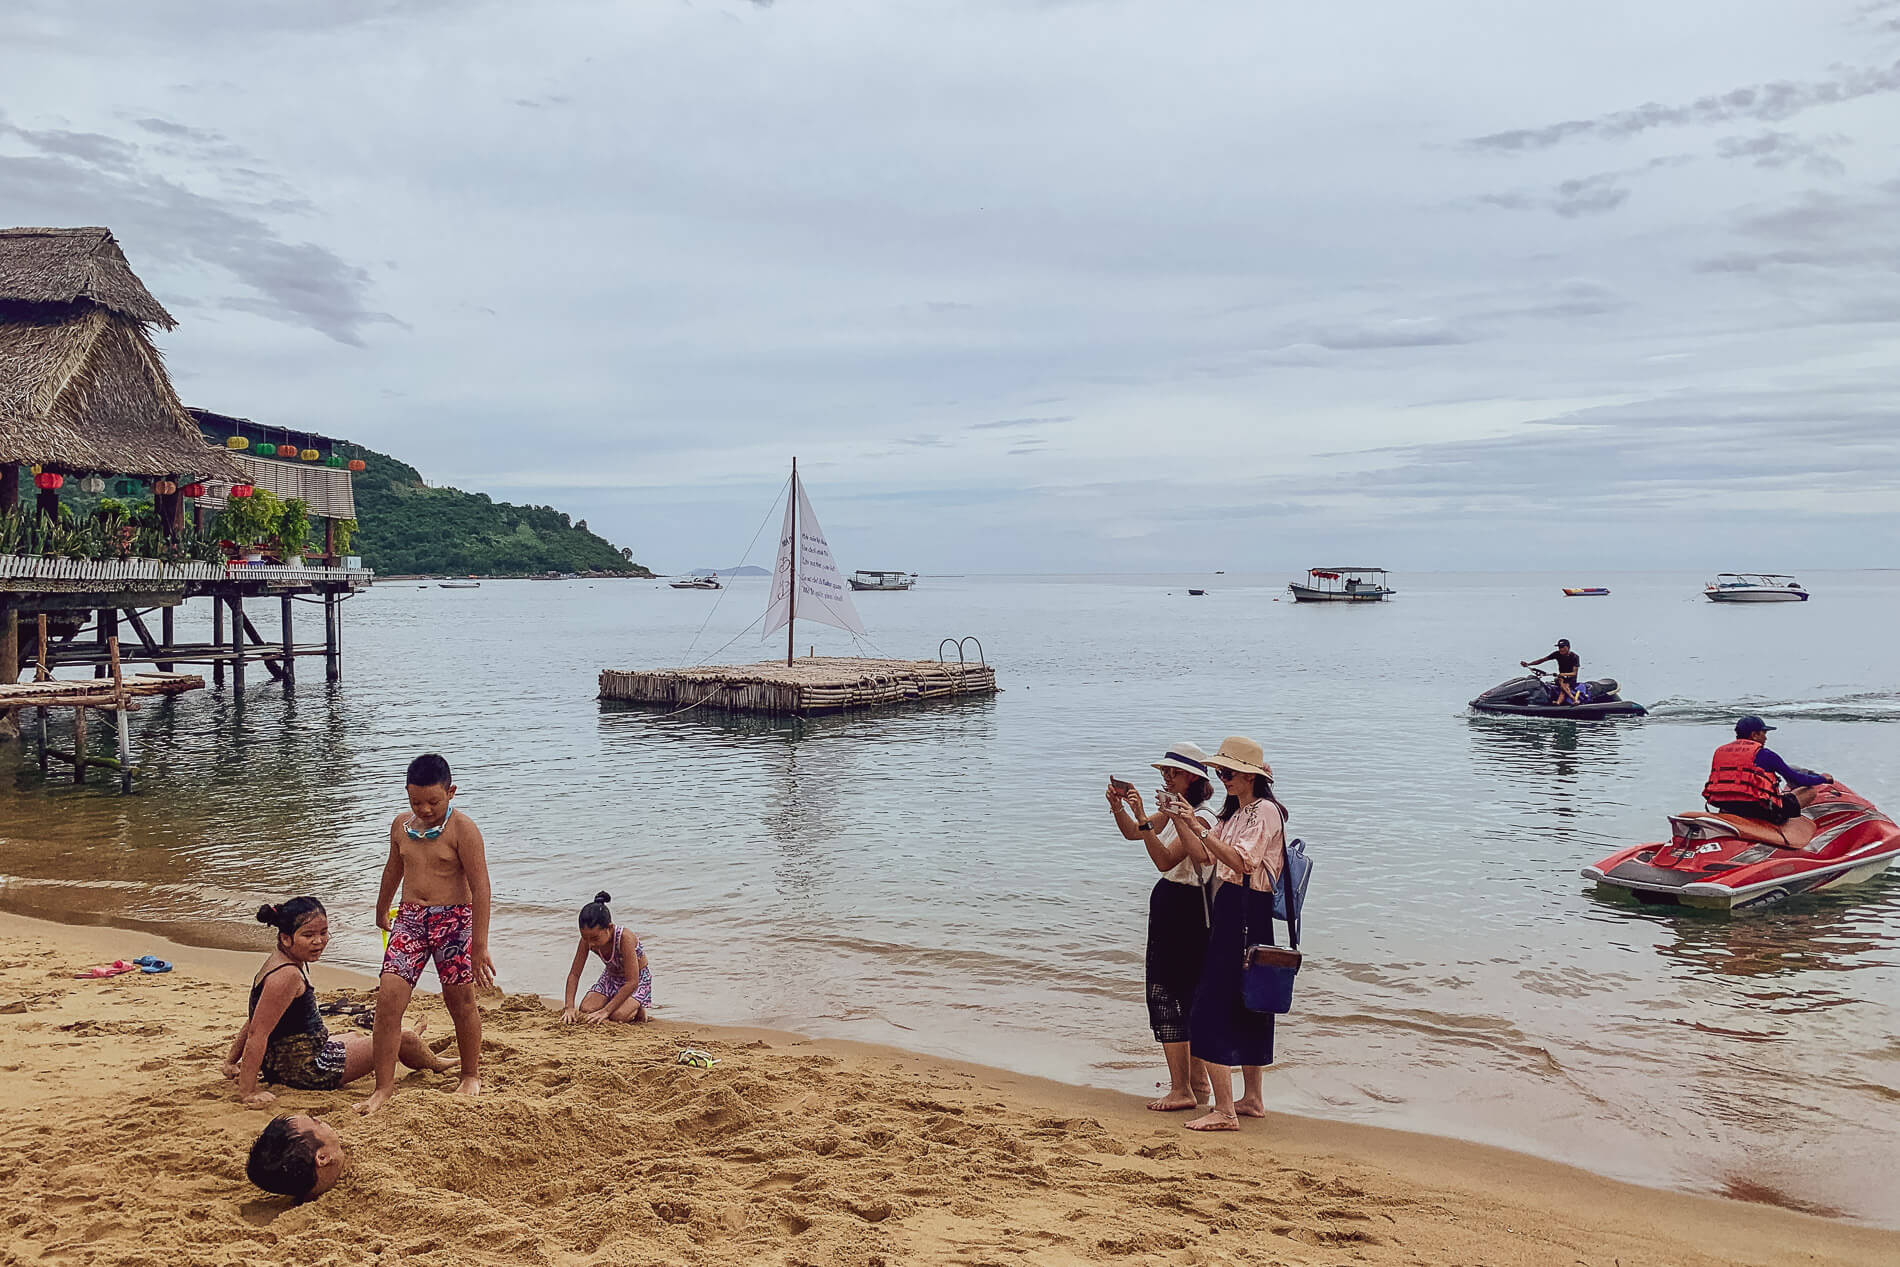 Bai Rang Beach and tourists at Da Nang Beach